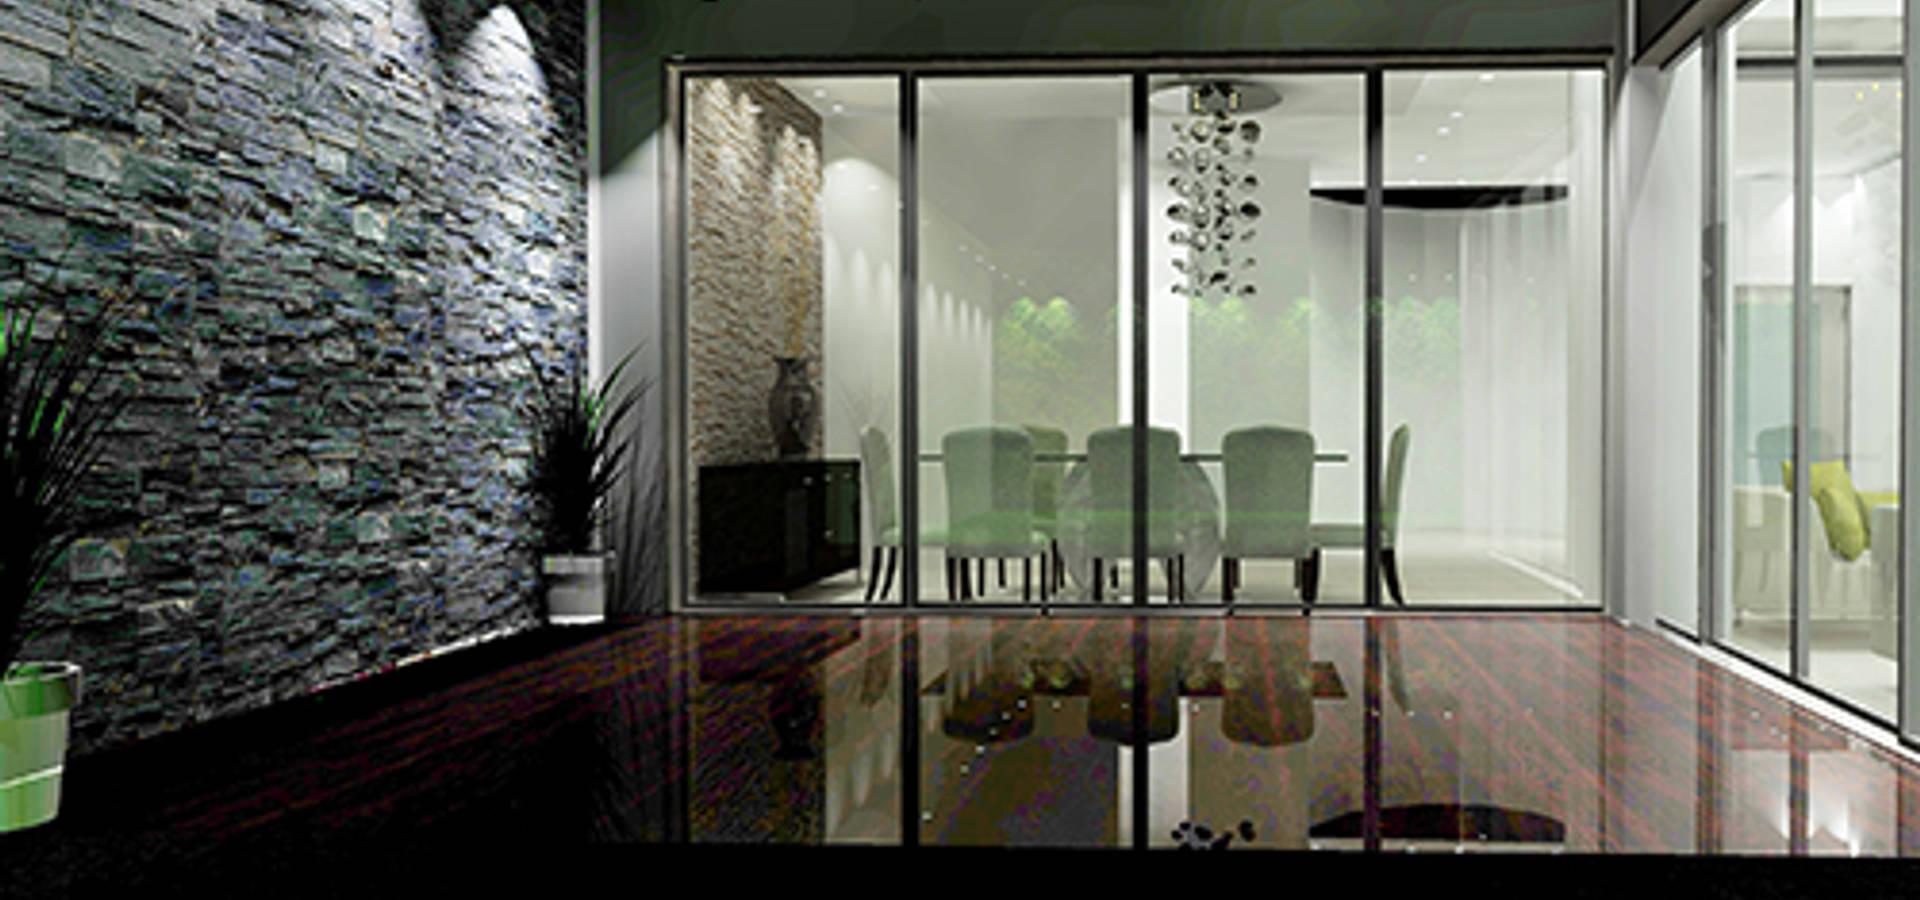 Dise o oficinas modernas por casas eco constructora homify for Constructora